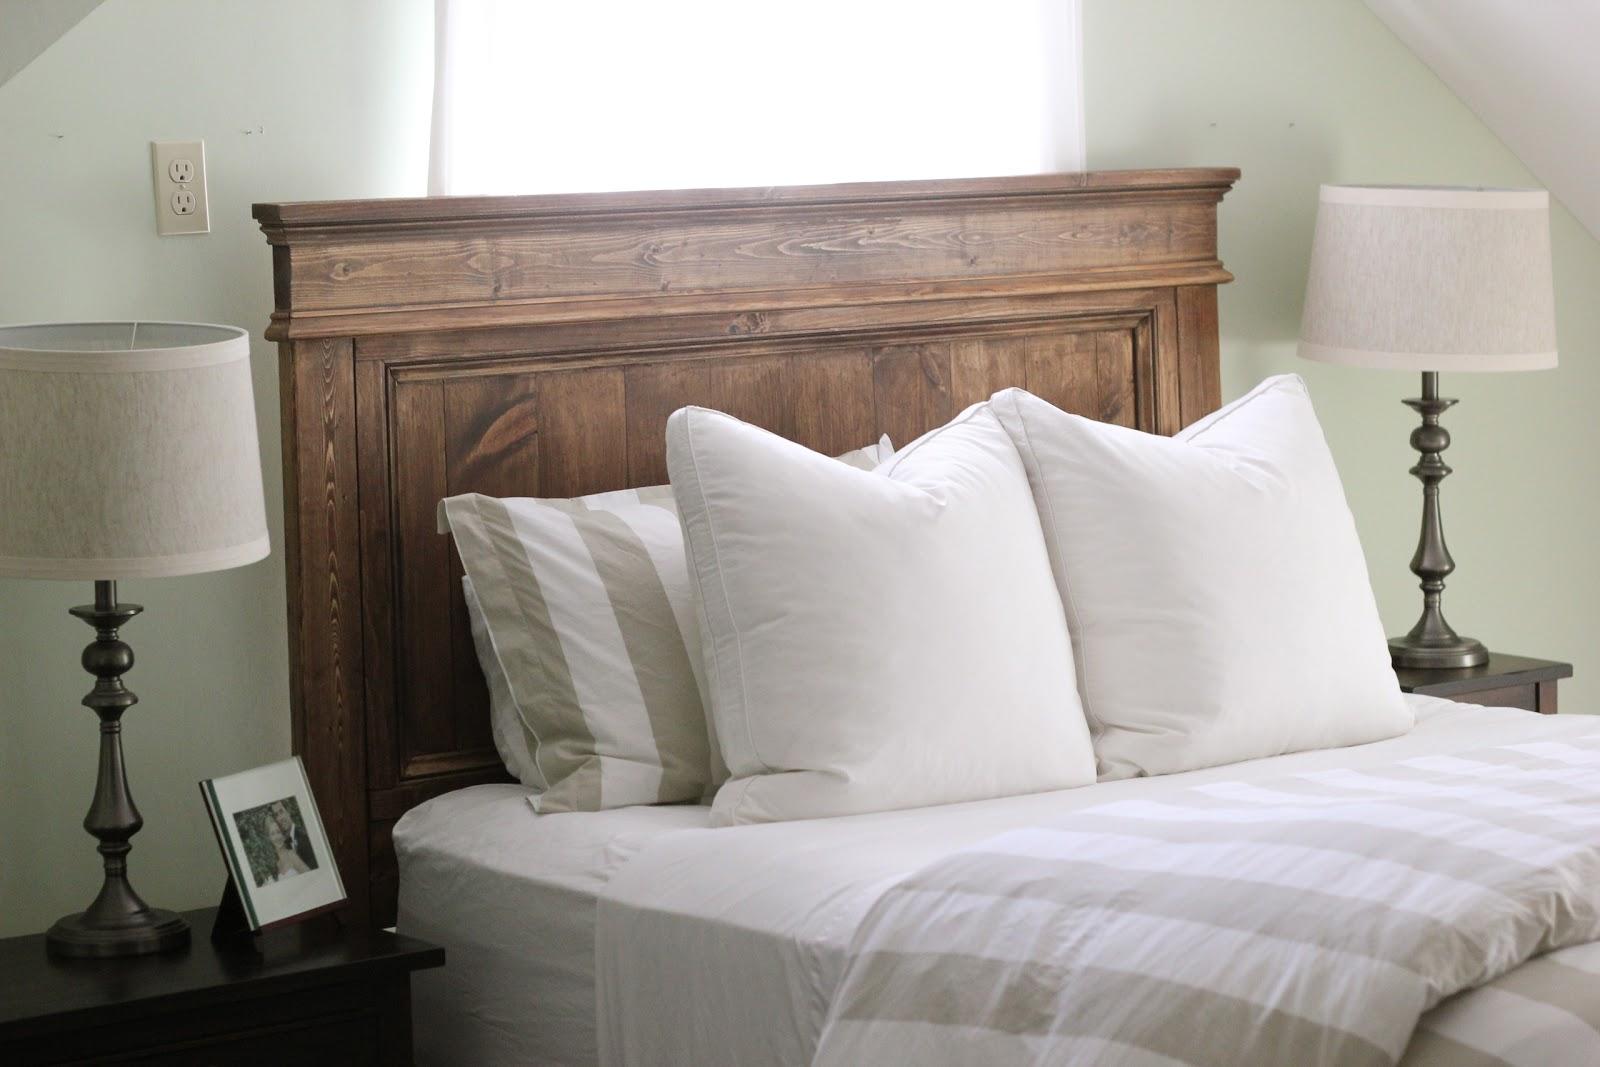 Jenny Steffens Hobick: We built a bed! DIY Wooden Headboard